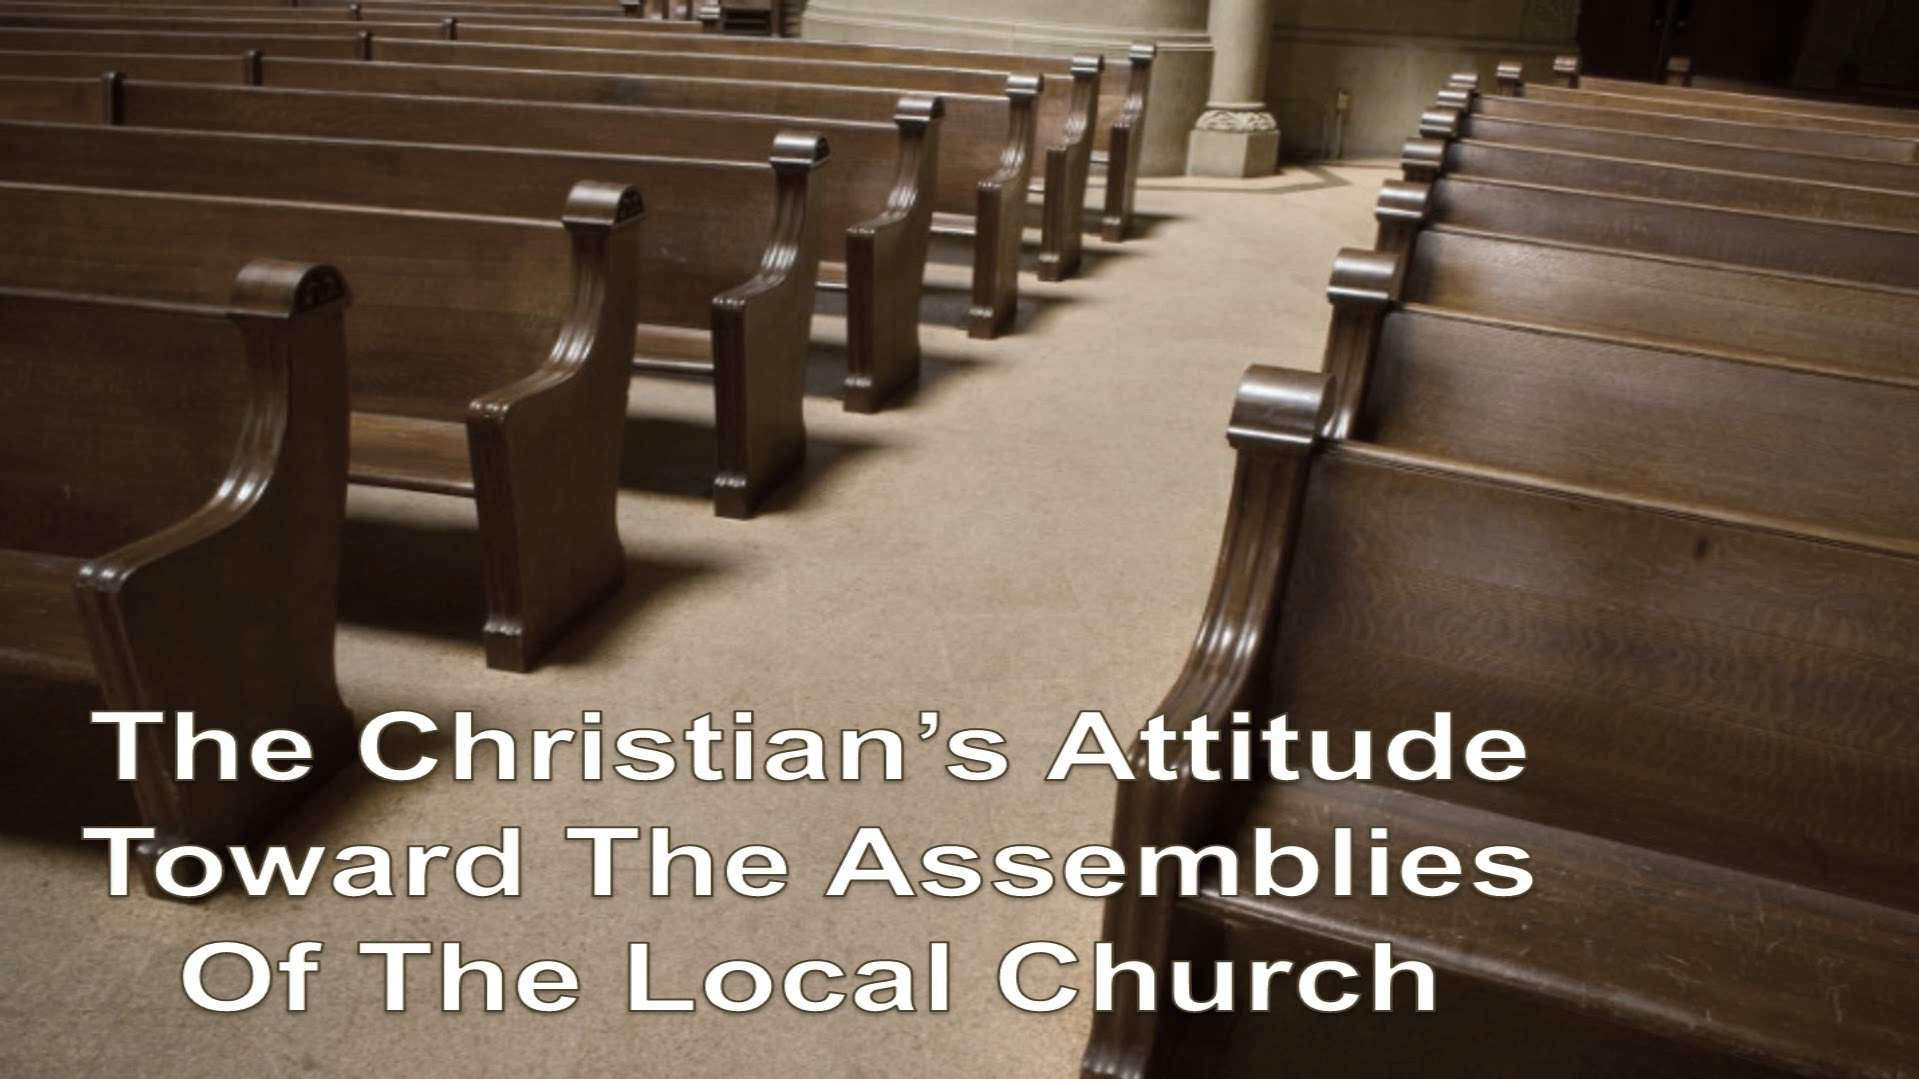 The Christian's Attitude Toward The Assemblies Of The Local Church